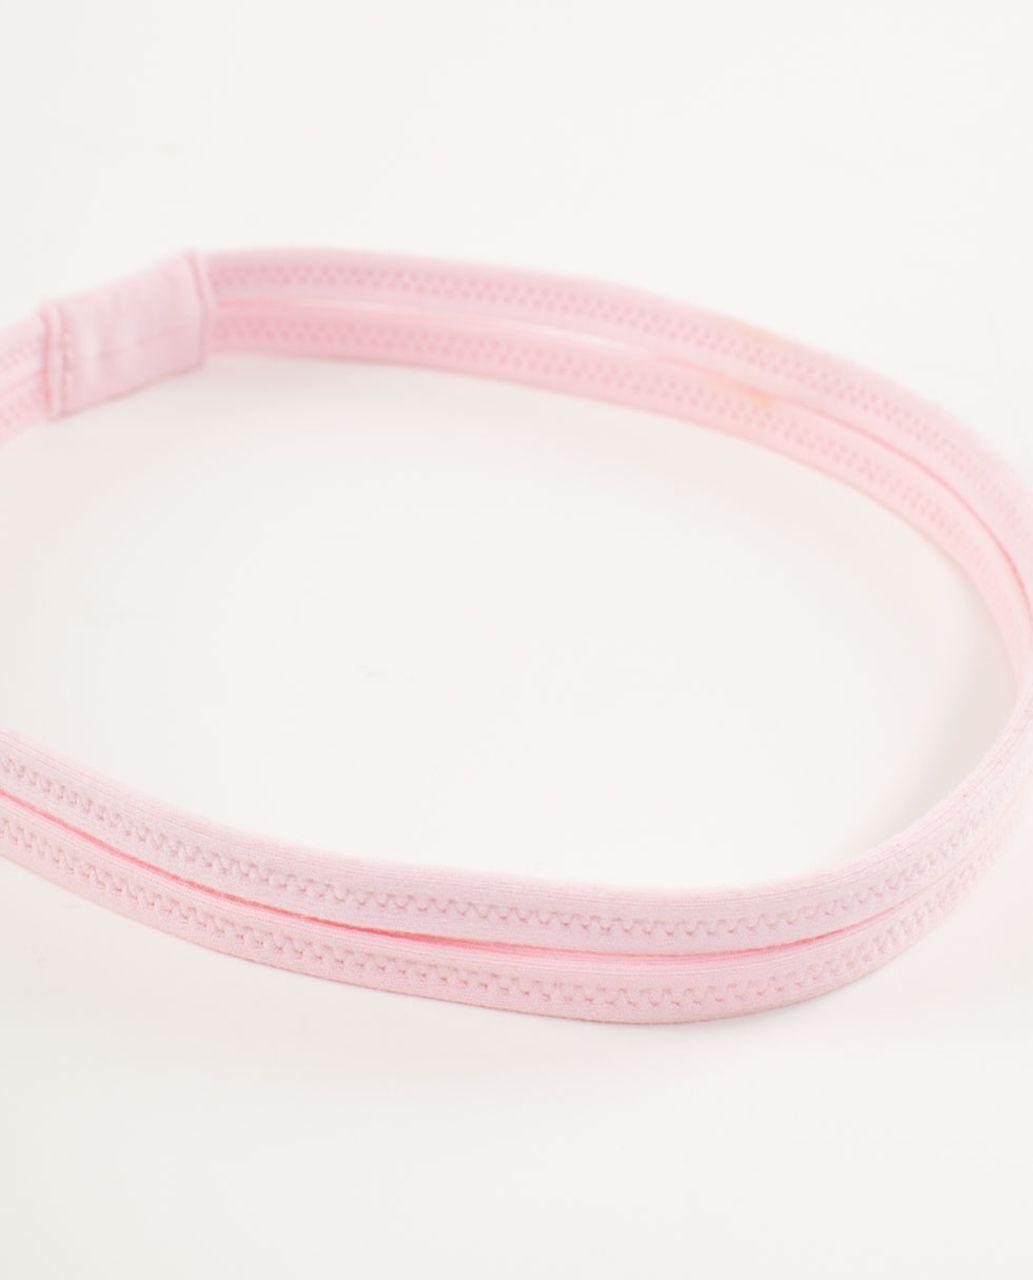 Lululemon DANCE! Headband - Pig Pink /  Heathered Pig Pink